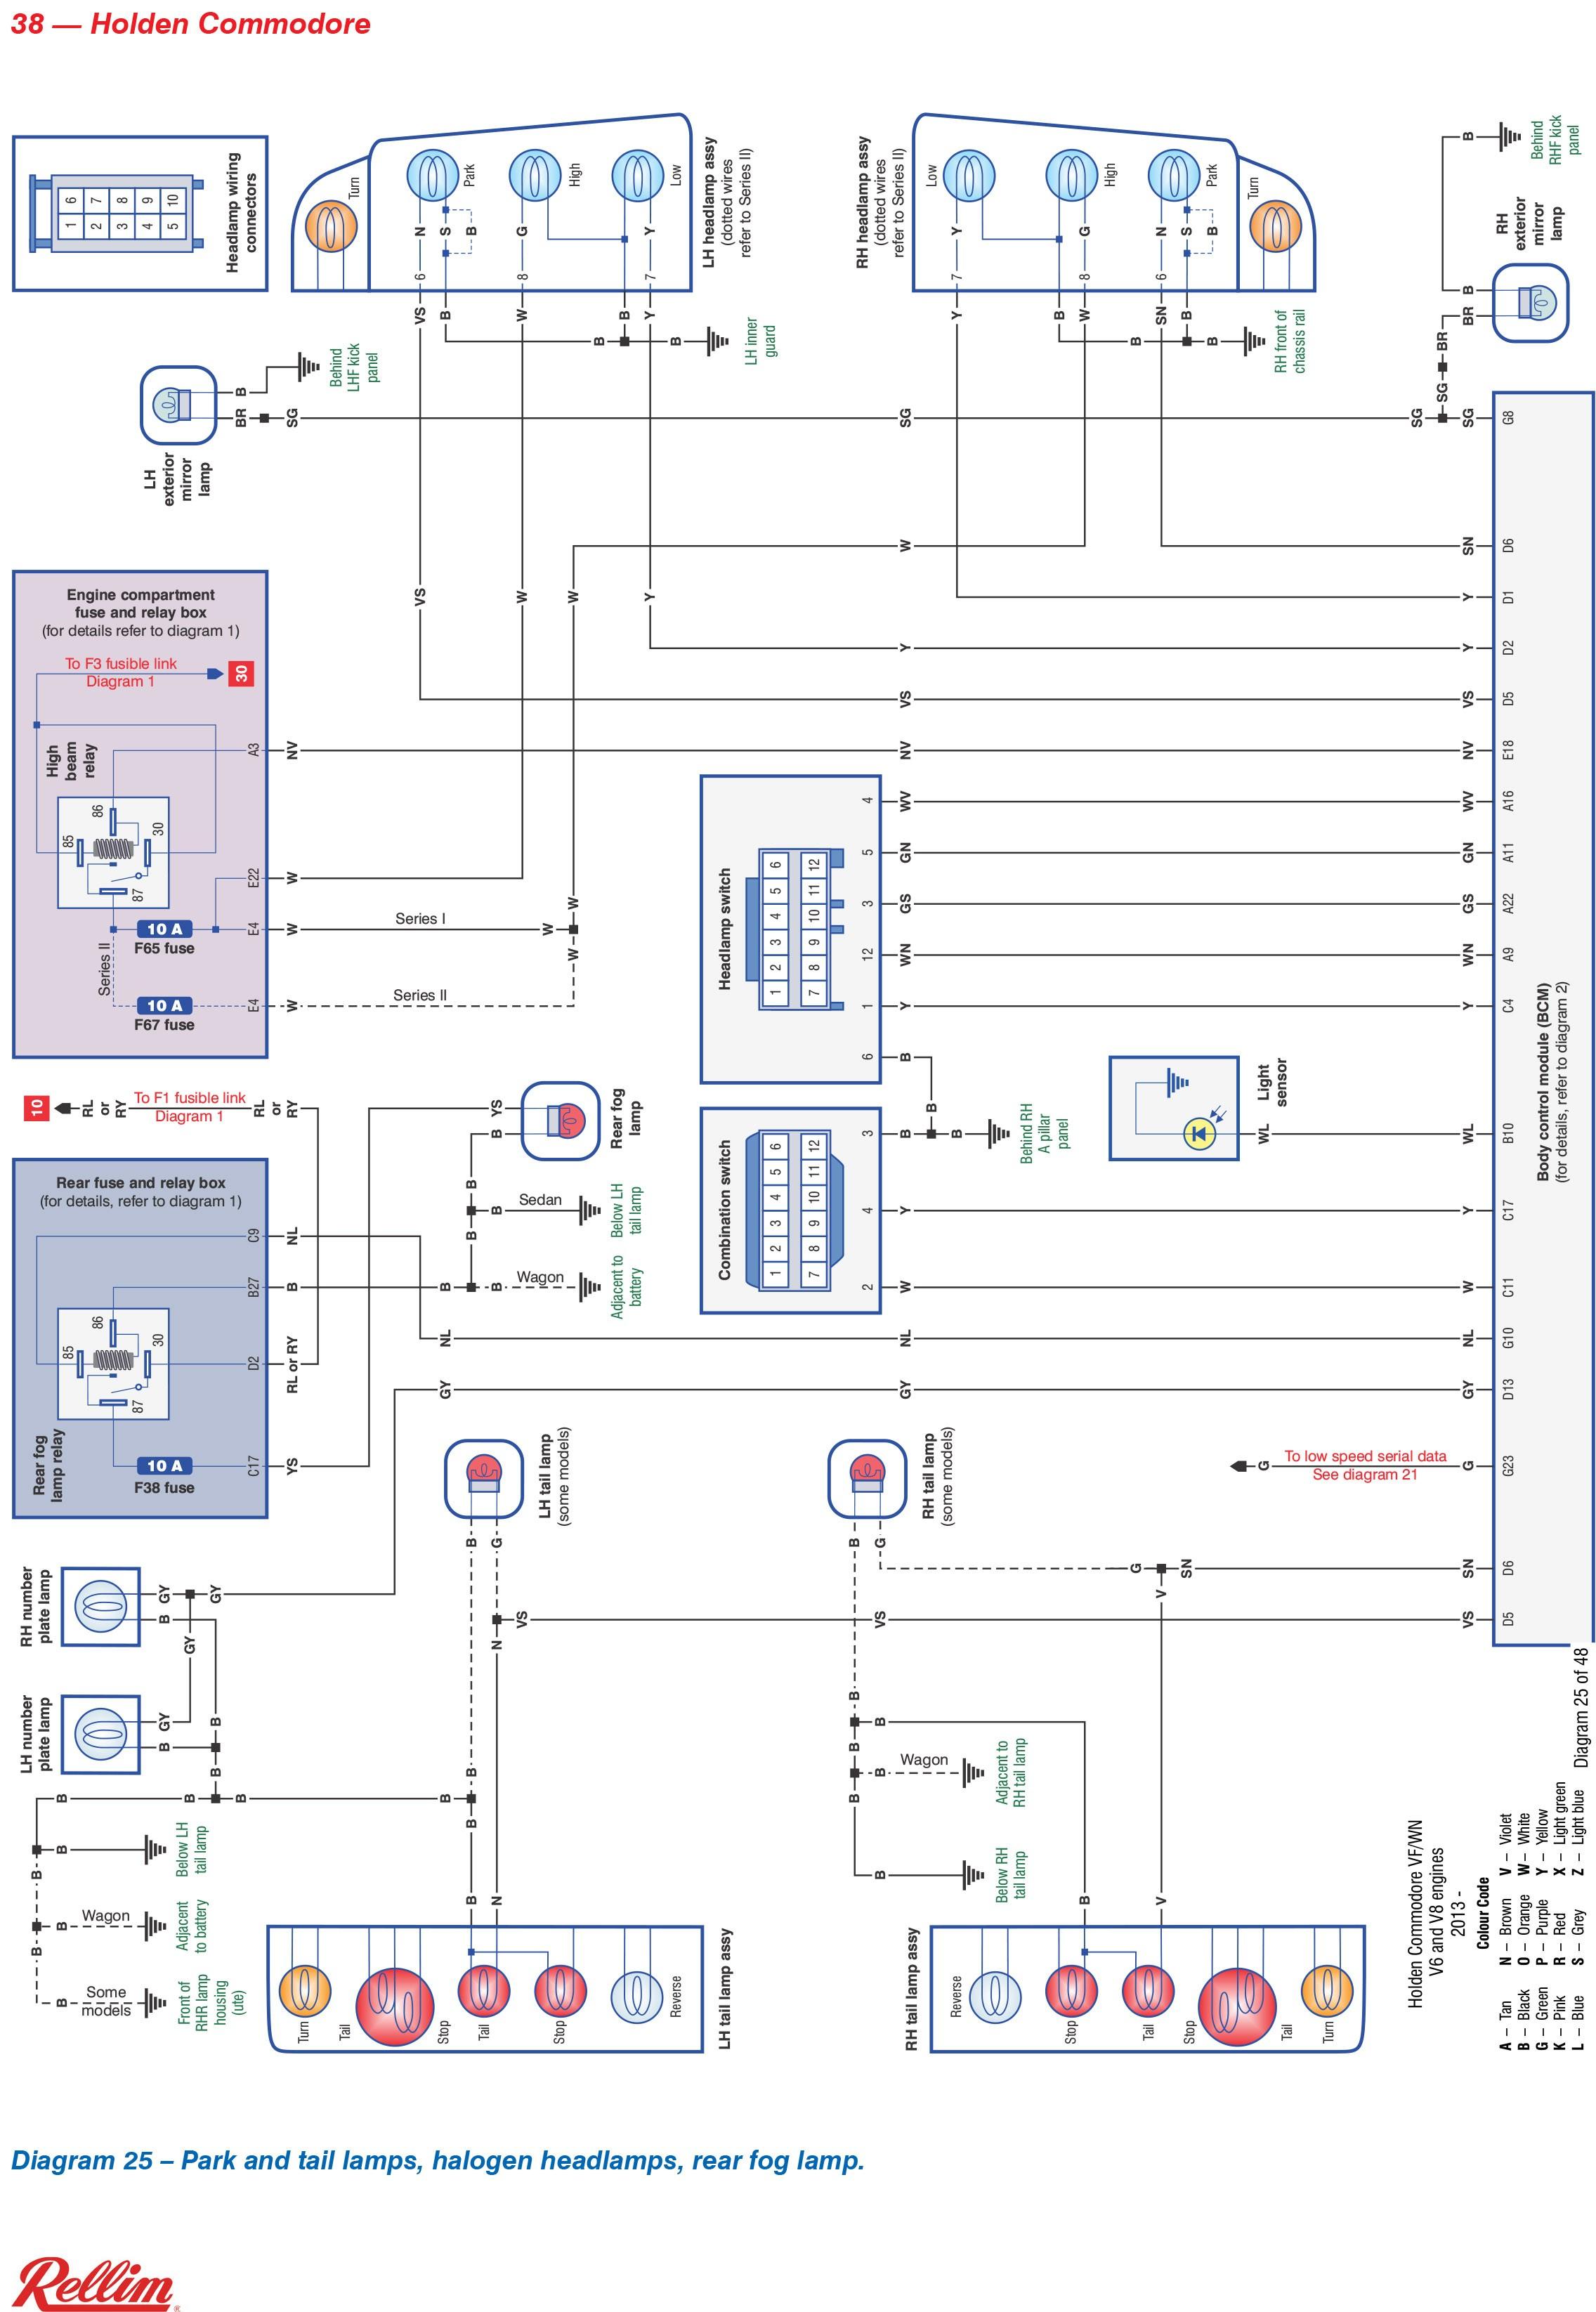 Mitsubishi Shogun Wiring Diagram | Manual E-Books - Chopper Wiring Diagram